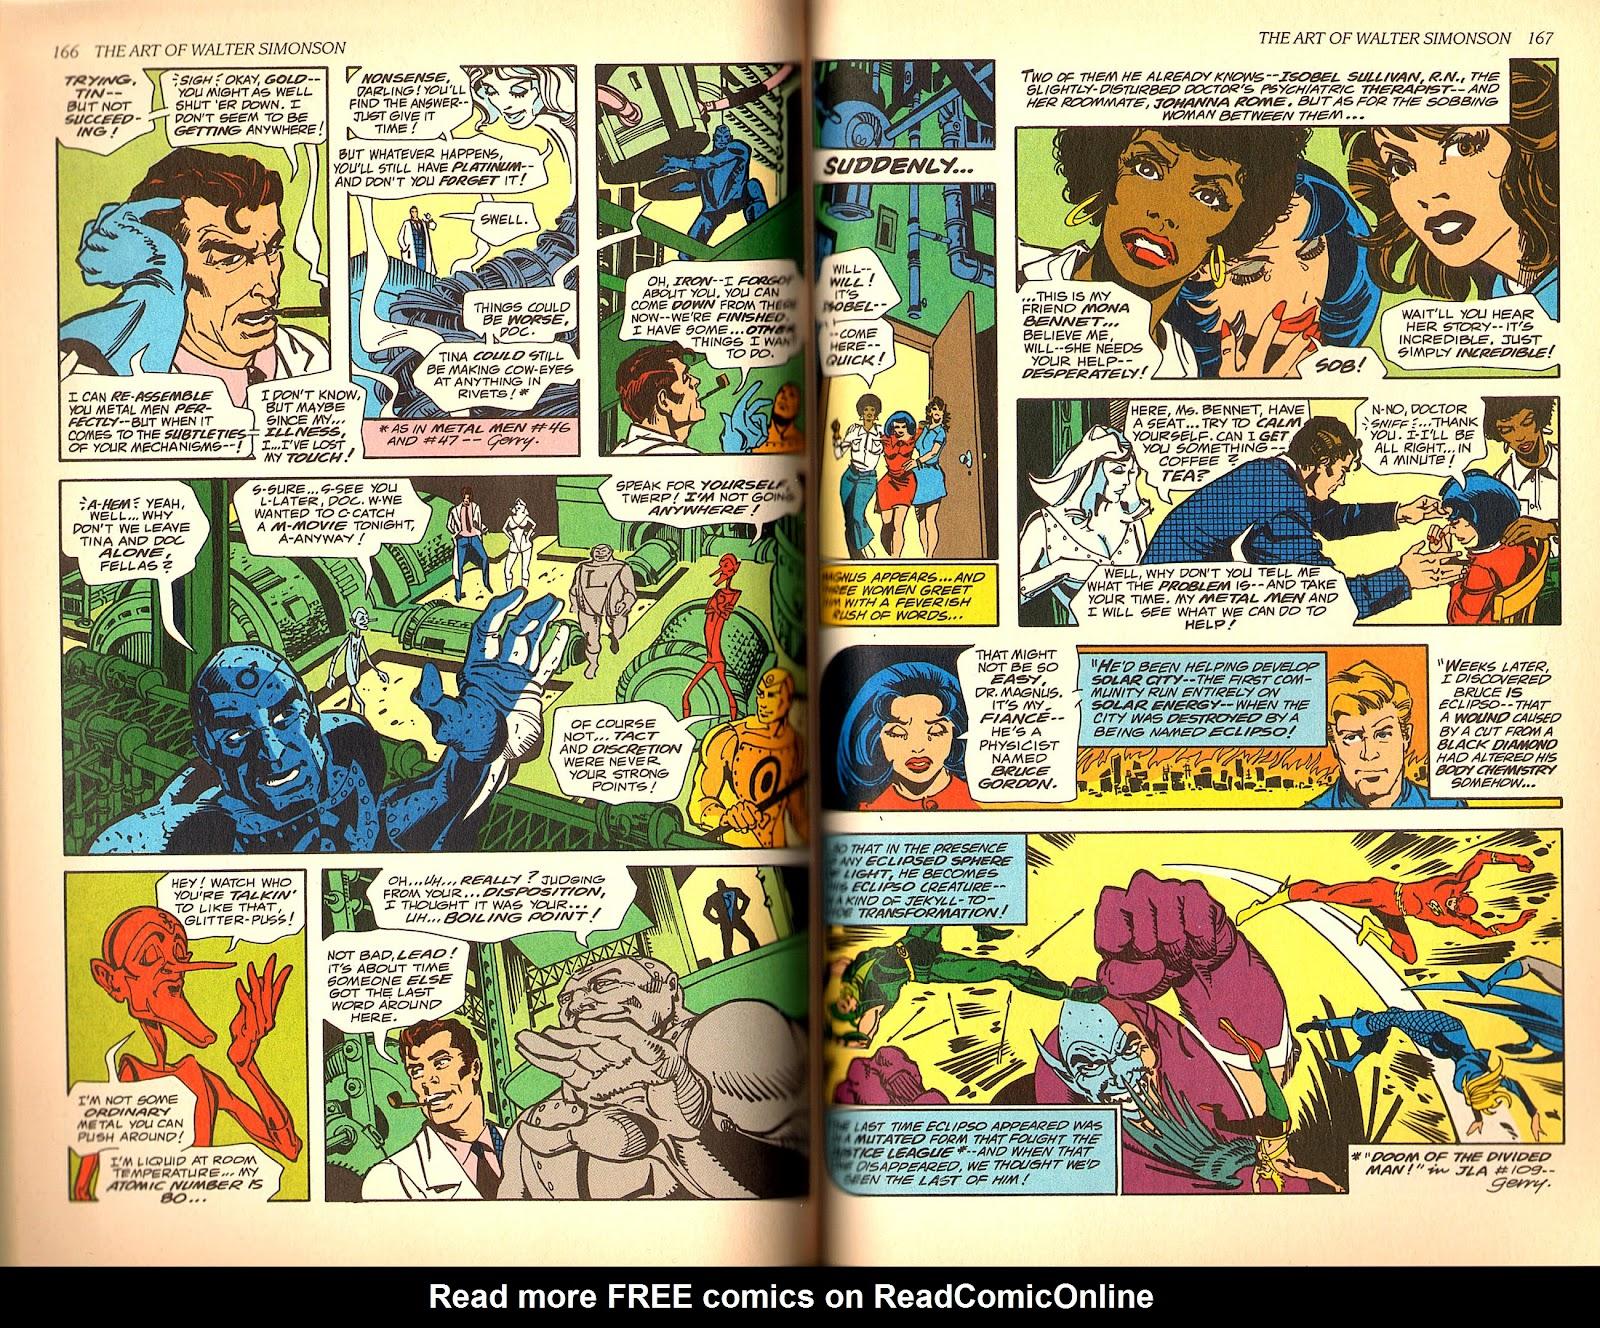 Read online The Art of Walter Simonson comic -  Issue # TPB - 85